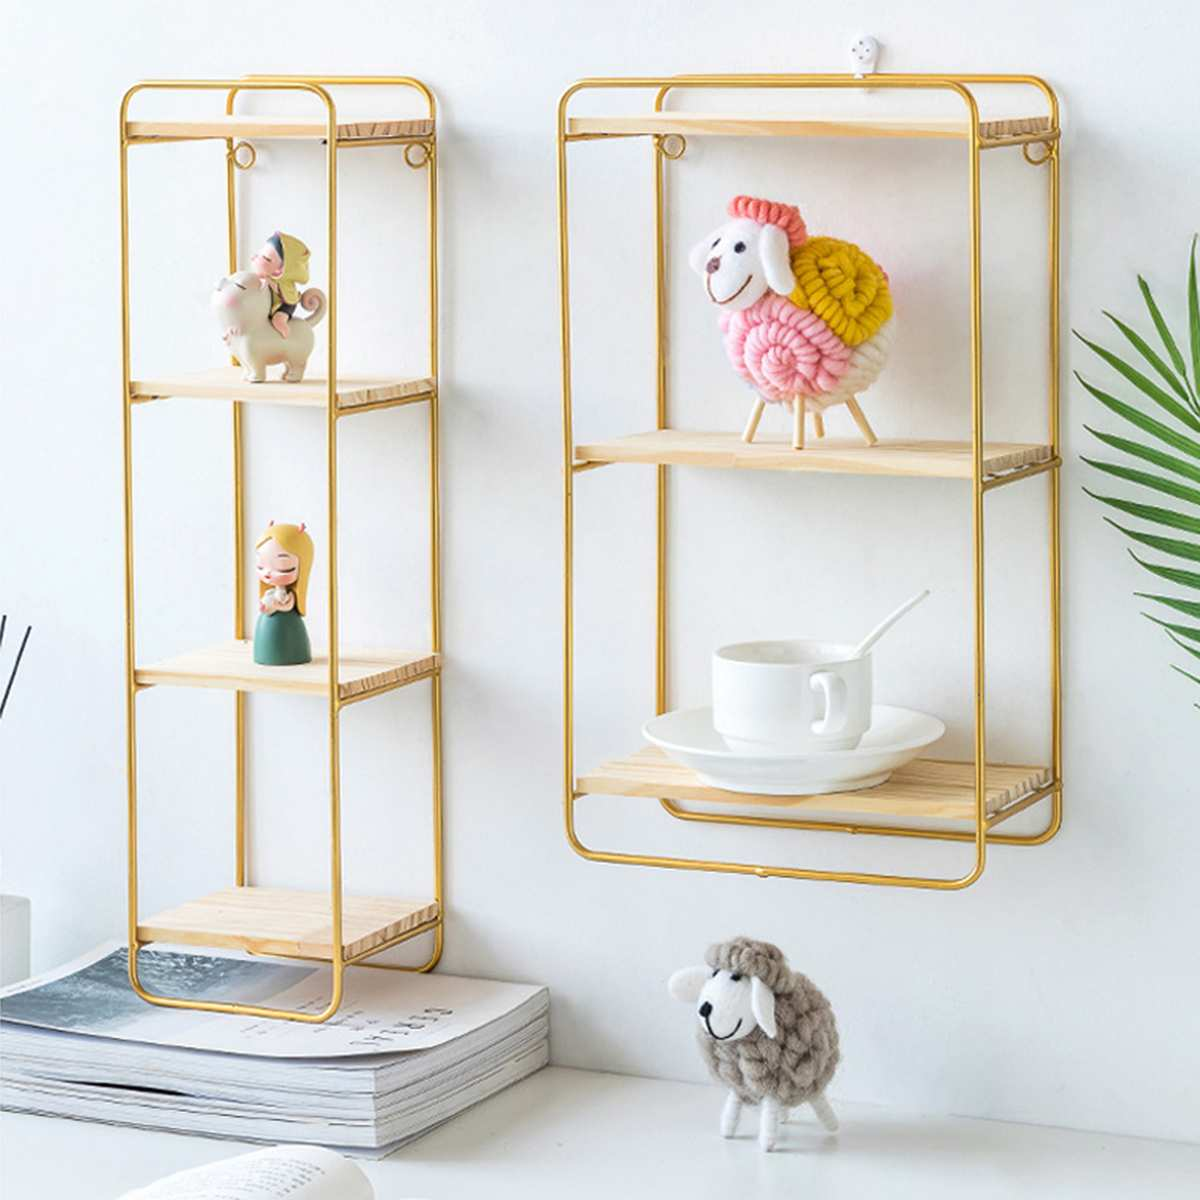 2 Colors Nordic Iron Rectangular Grid Wall Storage Rack Shelf Wall Hanging Geometric Figure Display Crafts Decorative Shelves